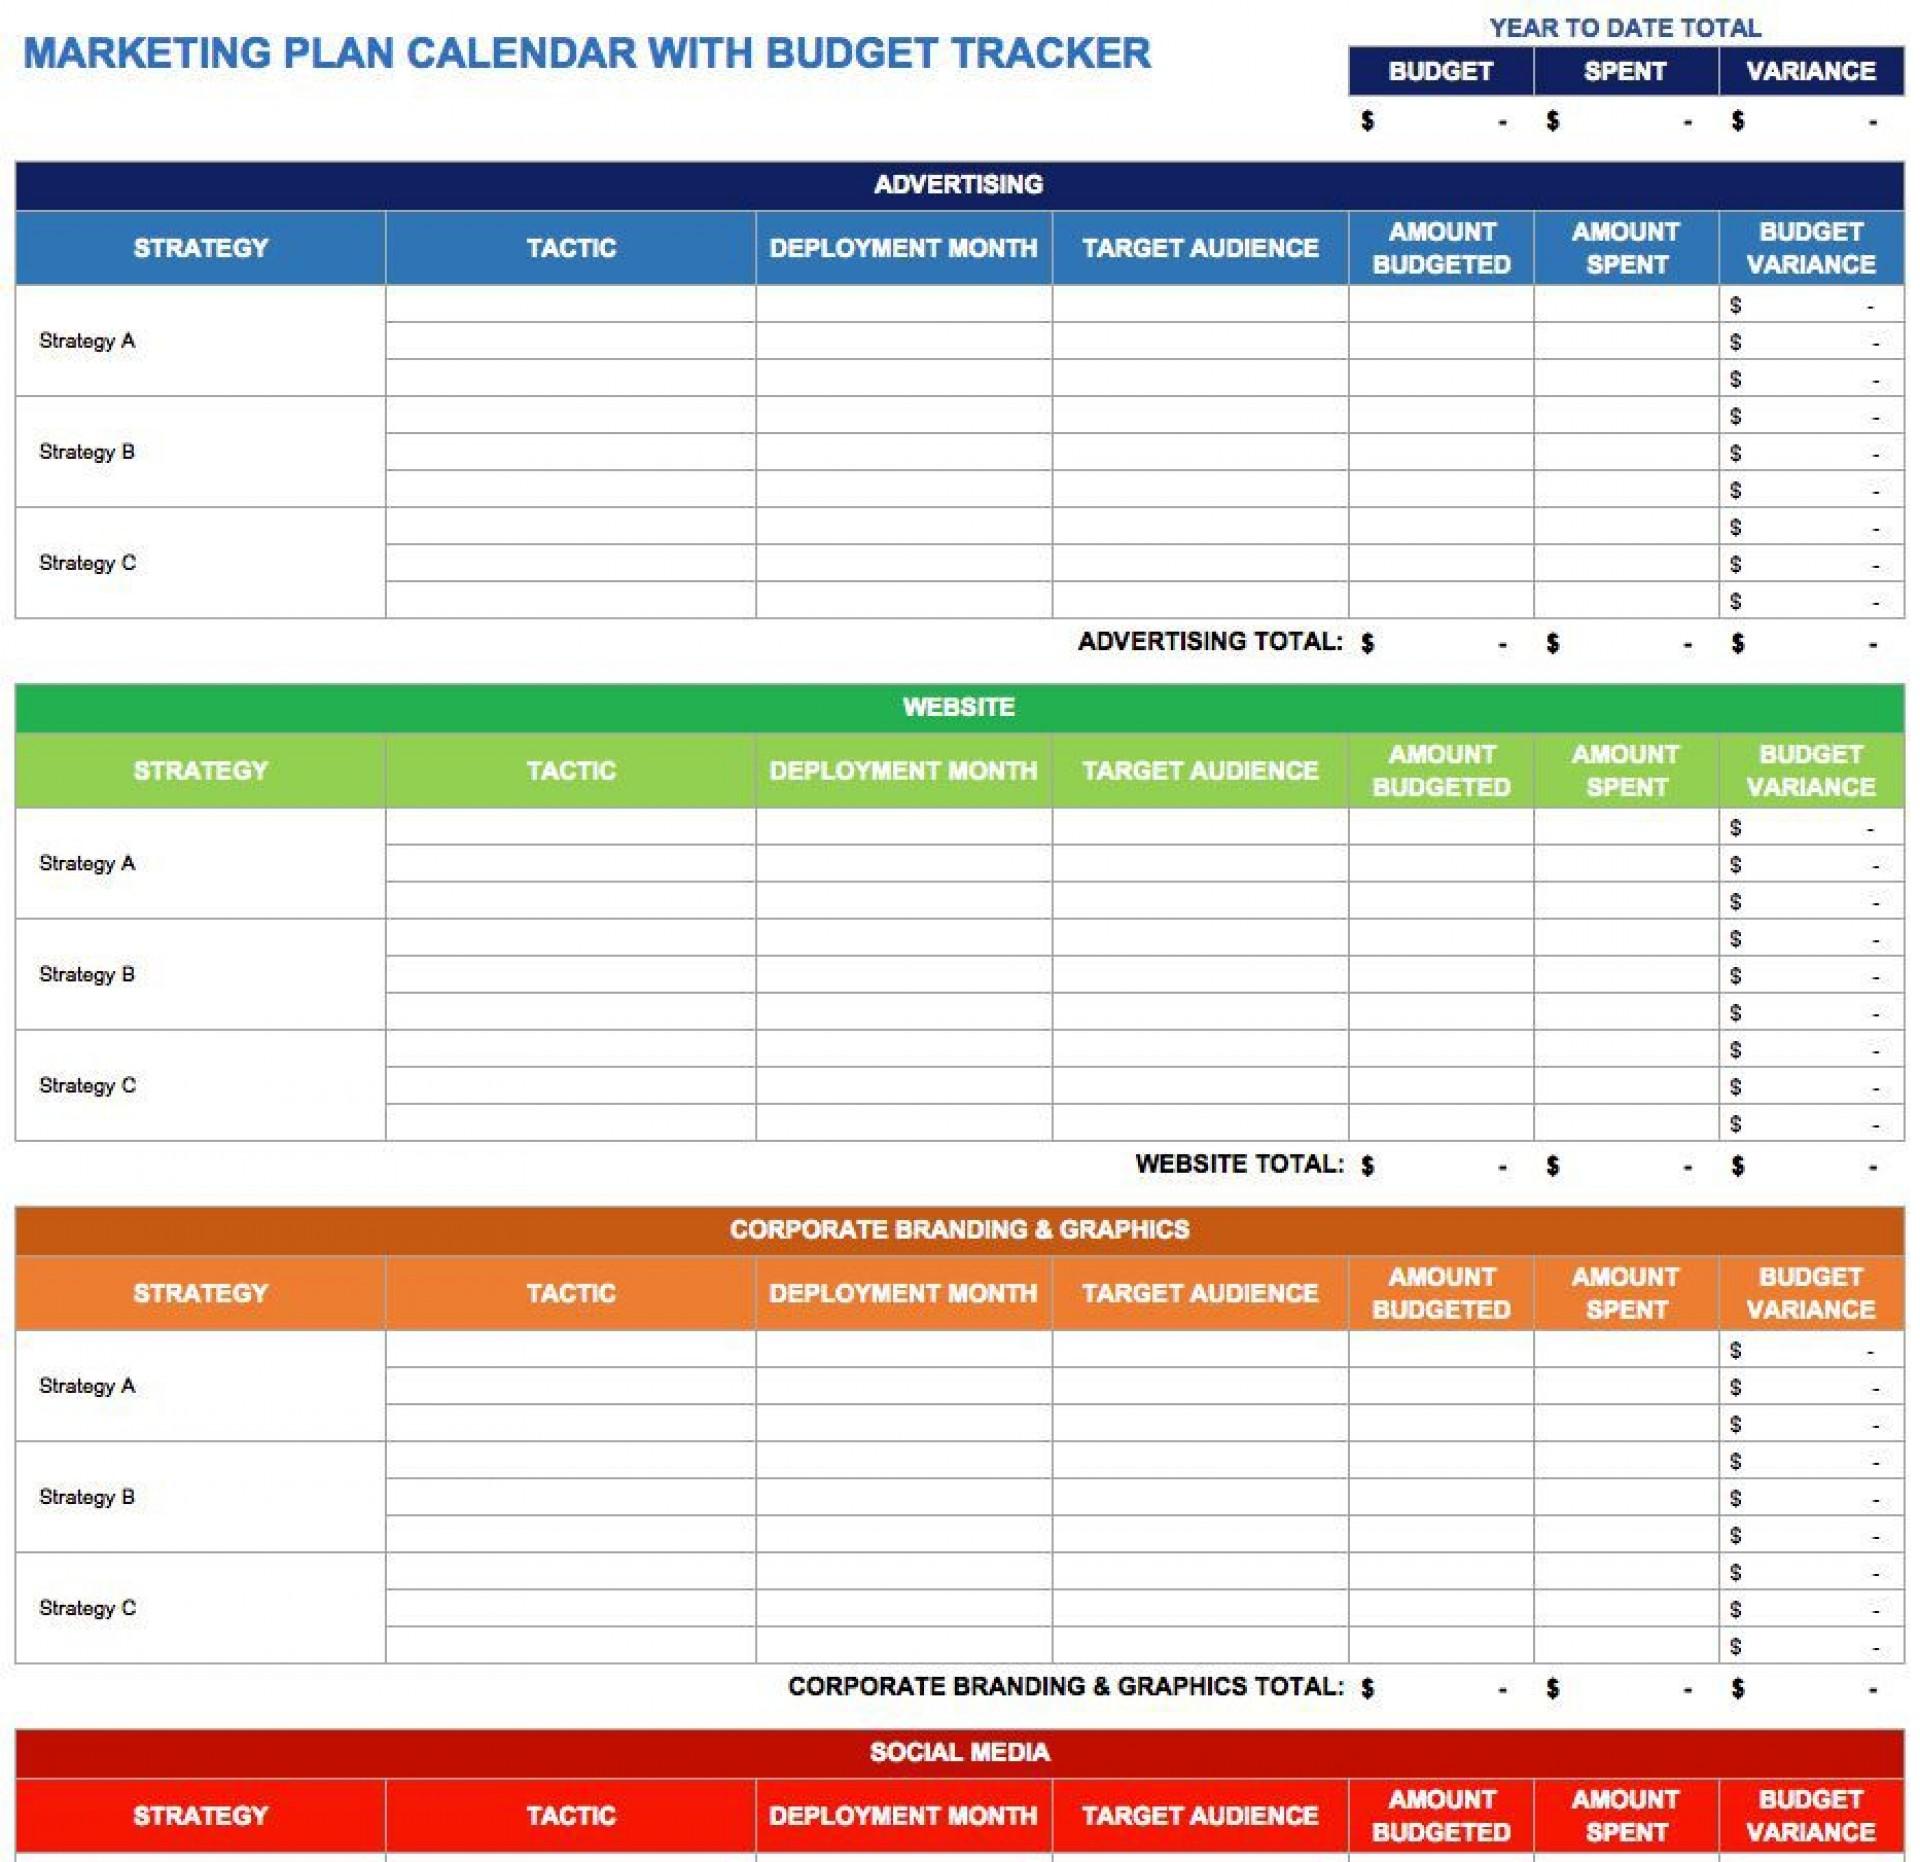 004 Top Free Marketing Plan Template Word Design  Digital Download1920